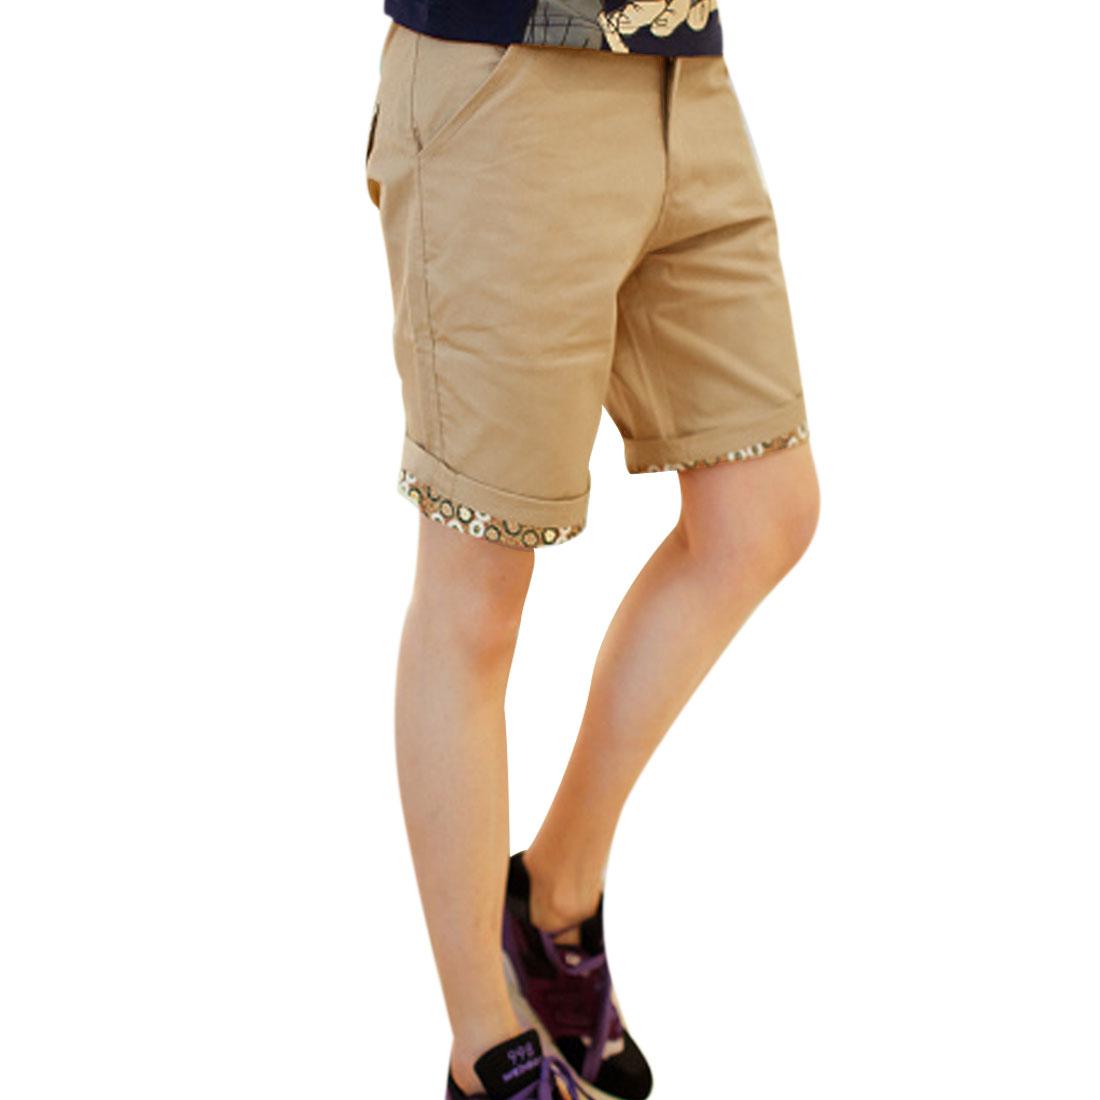 Man Floral Pattern Details Buttoned Pockets Shorts Khaki W33